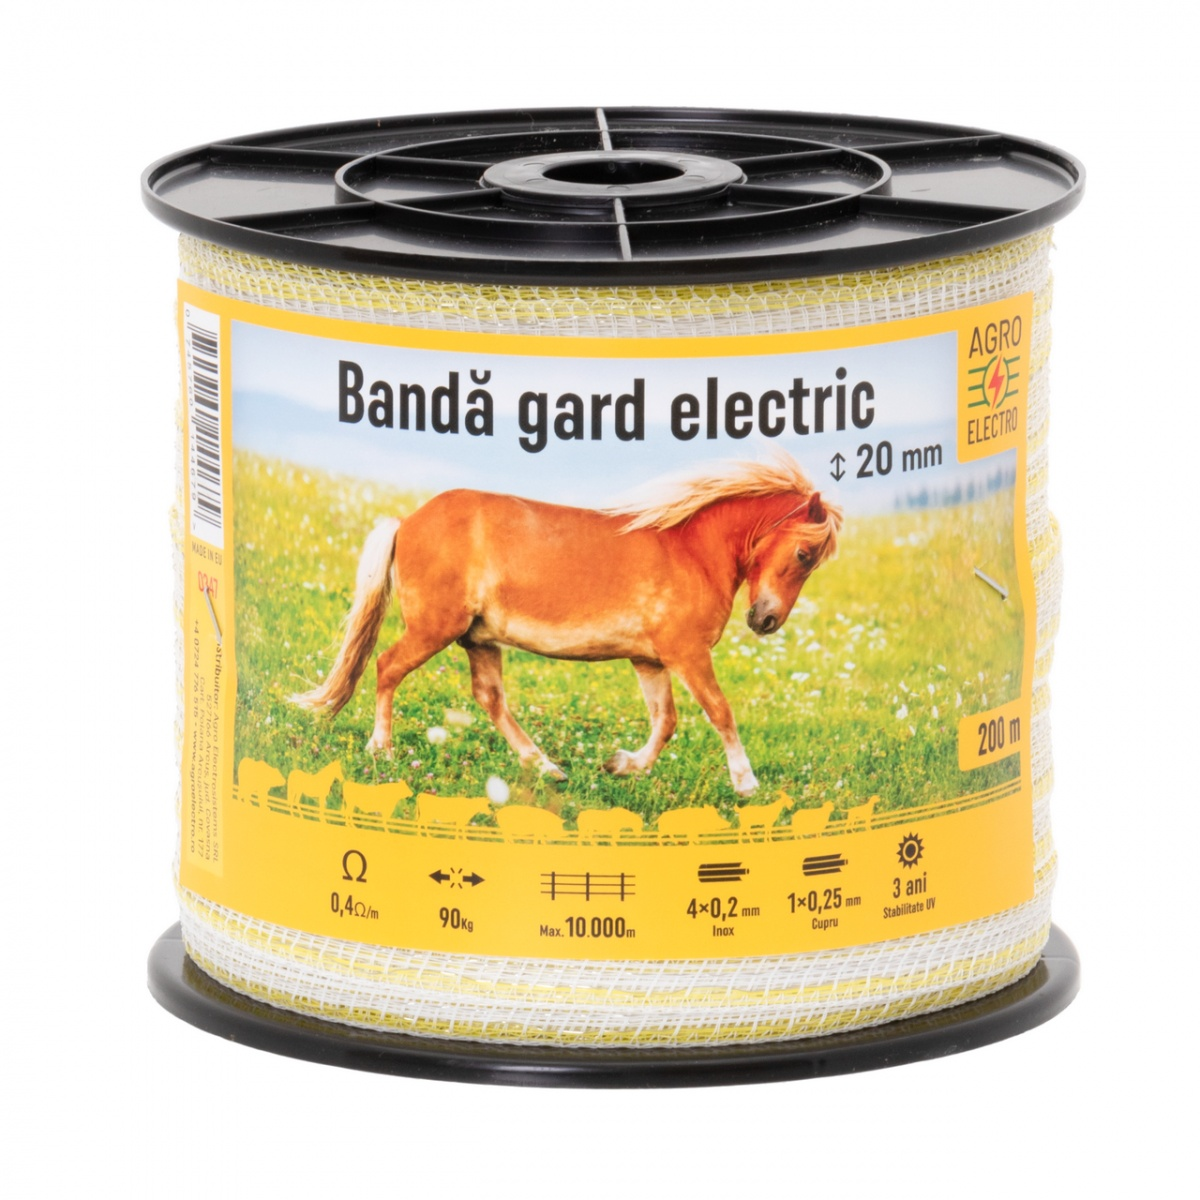 Bandă gard electric - 20 mm - 200m - 90kg - 0,4Ω/m